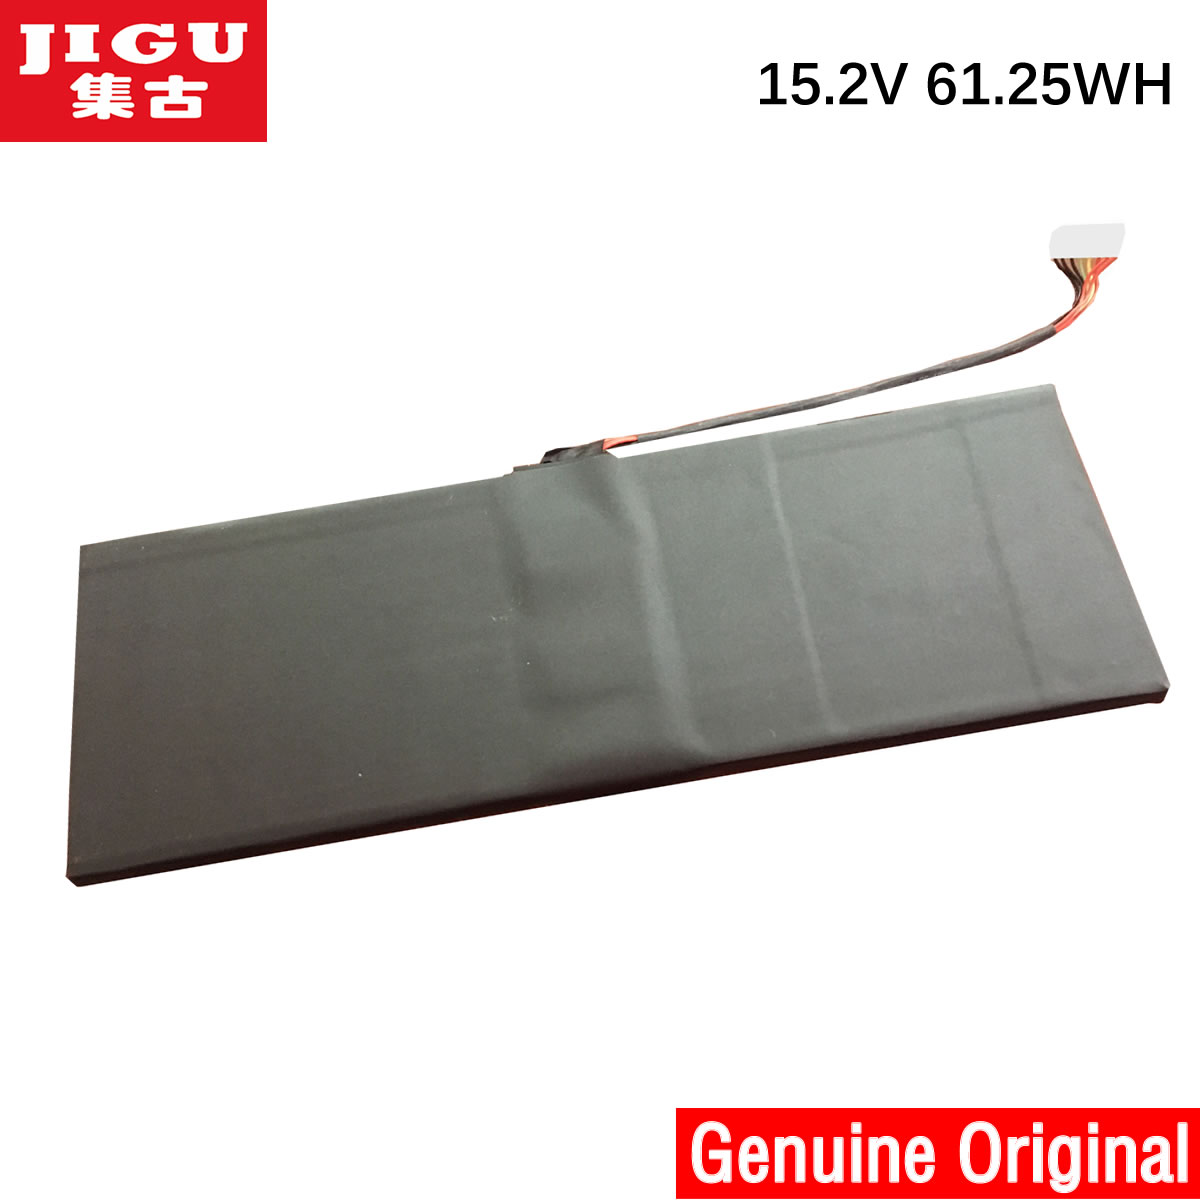 JIGU Original laptop battery GNC-J40 916TA013F for SCHENKER XMG C504 FOR GIGABYTE P34G v2 P34 V4 P34G v2 P34W v3 v4 laptop keyboard for gigabyte p35g v2 p35w p35w v3 p35x v3 p35k v2 v3 u35f black fr french